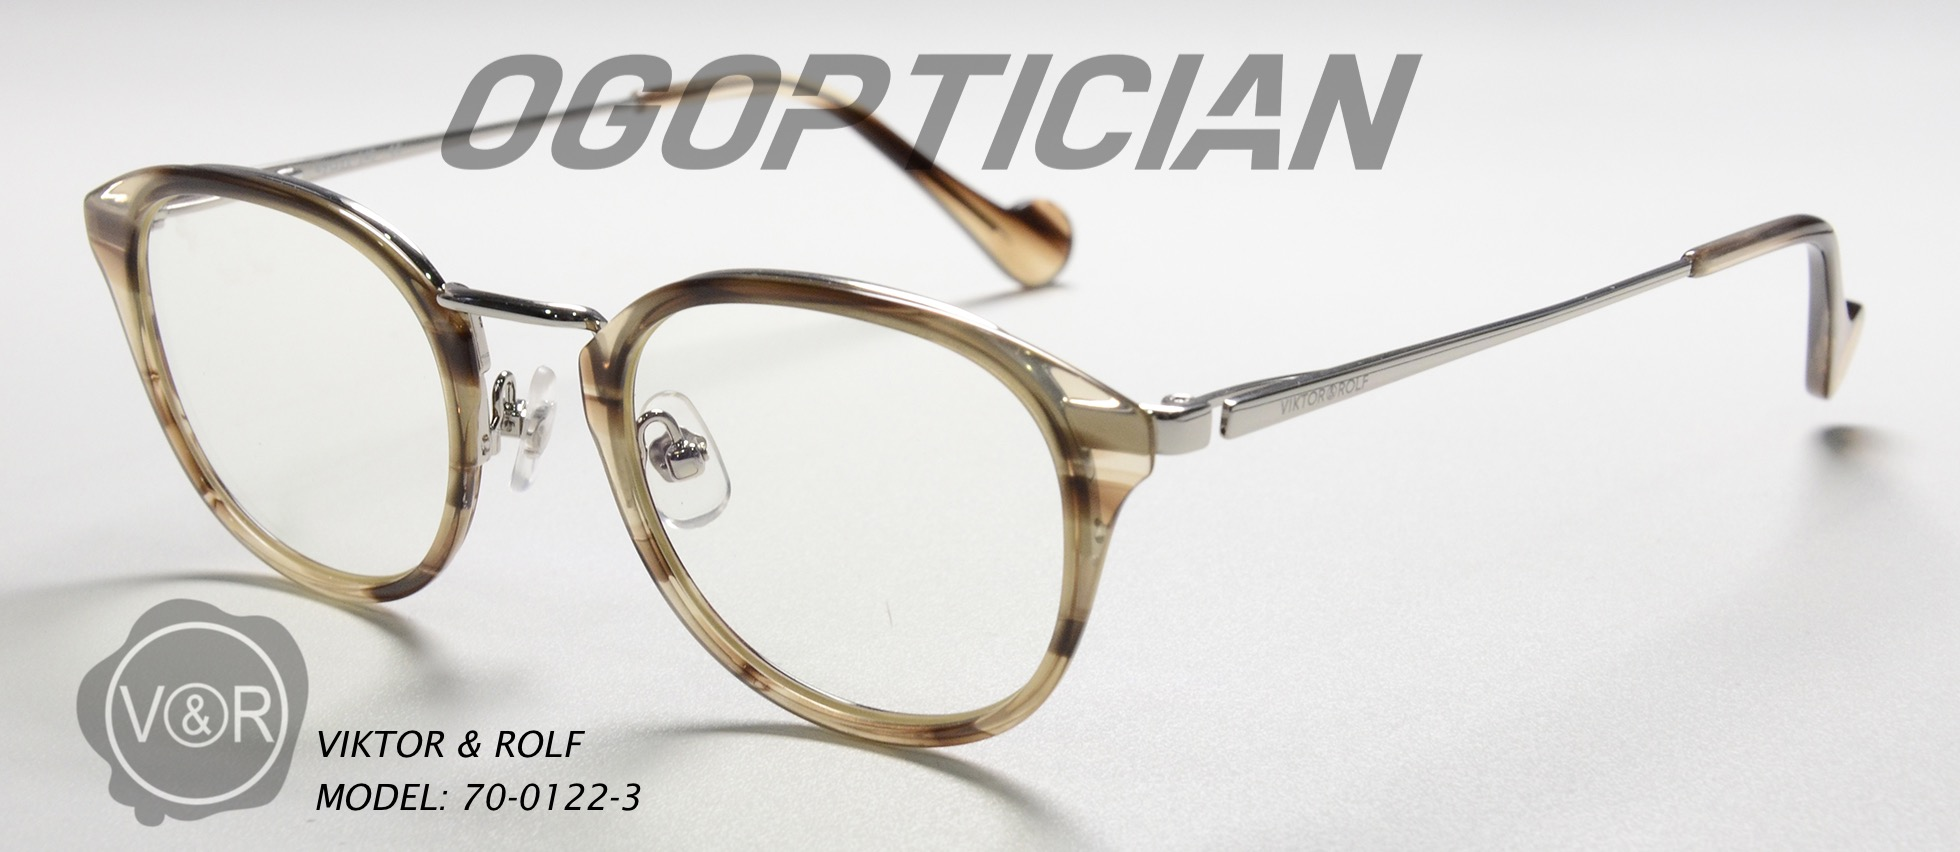 VIKTORANDROLF 70-0122-3